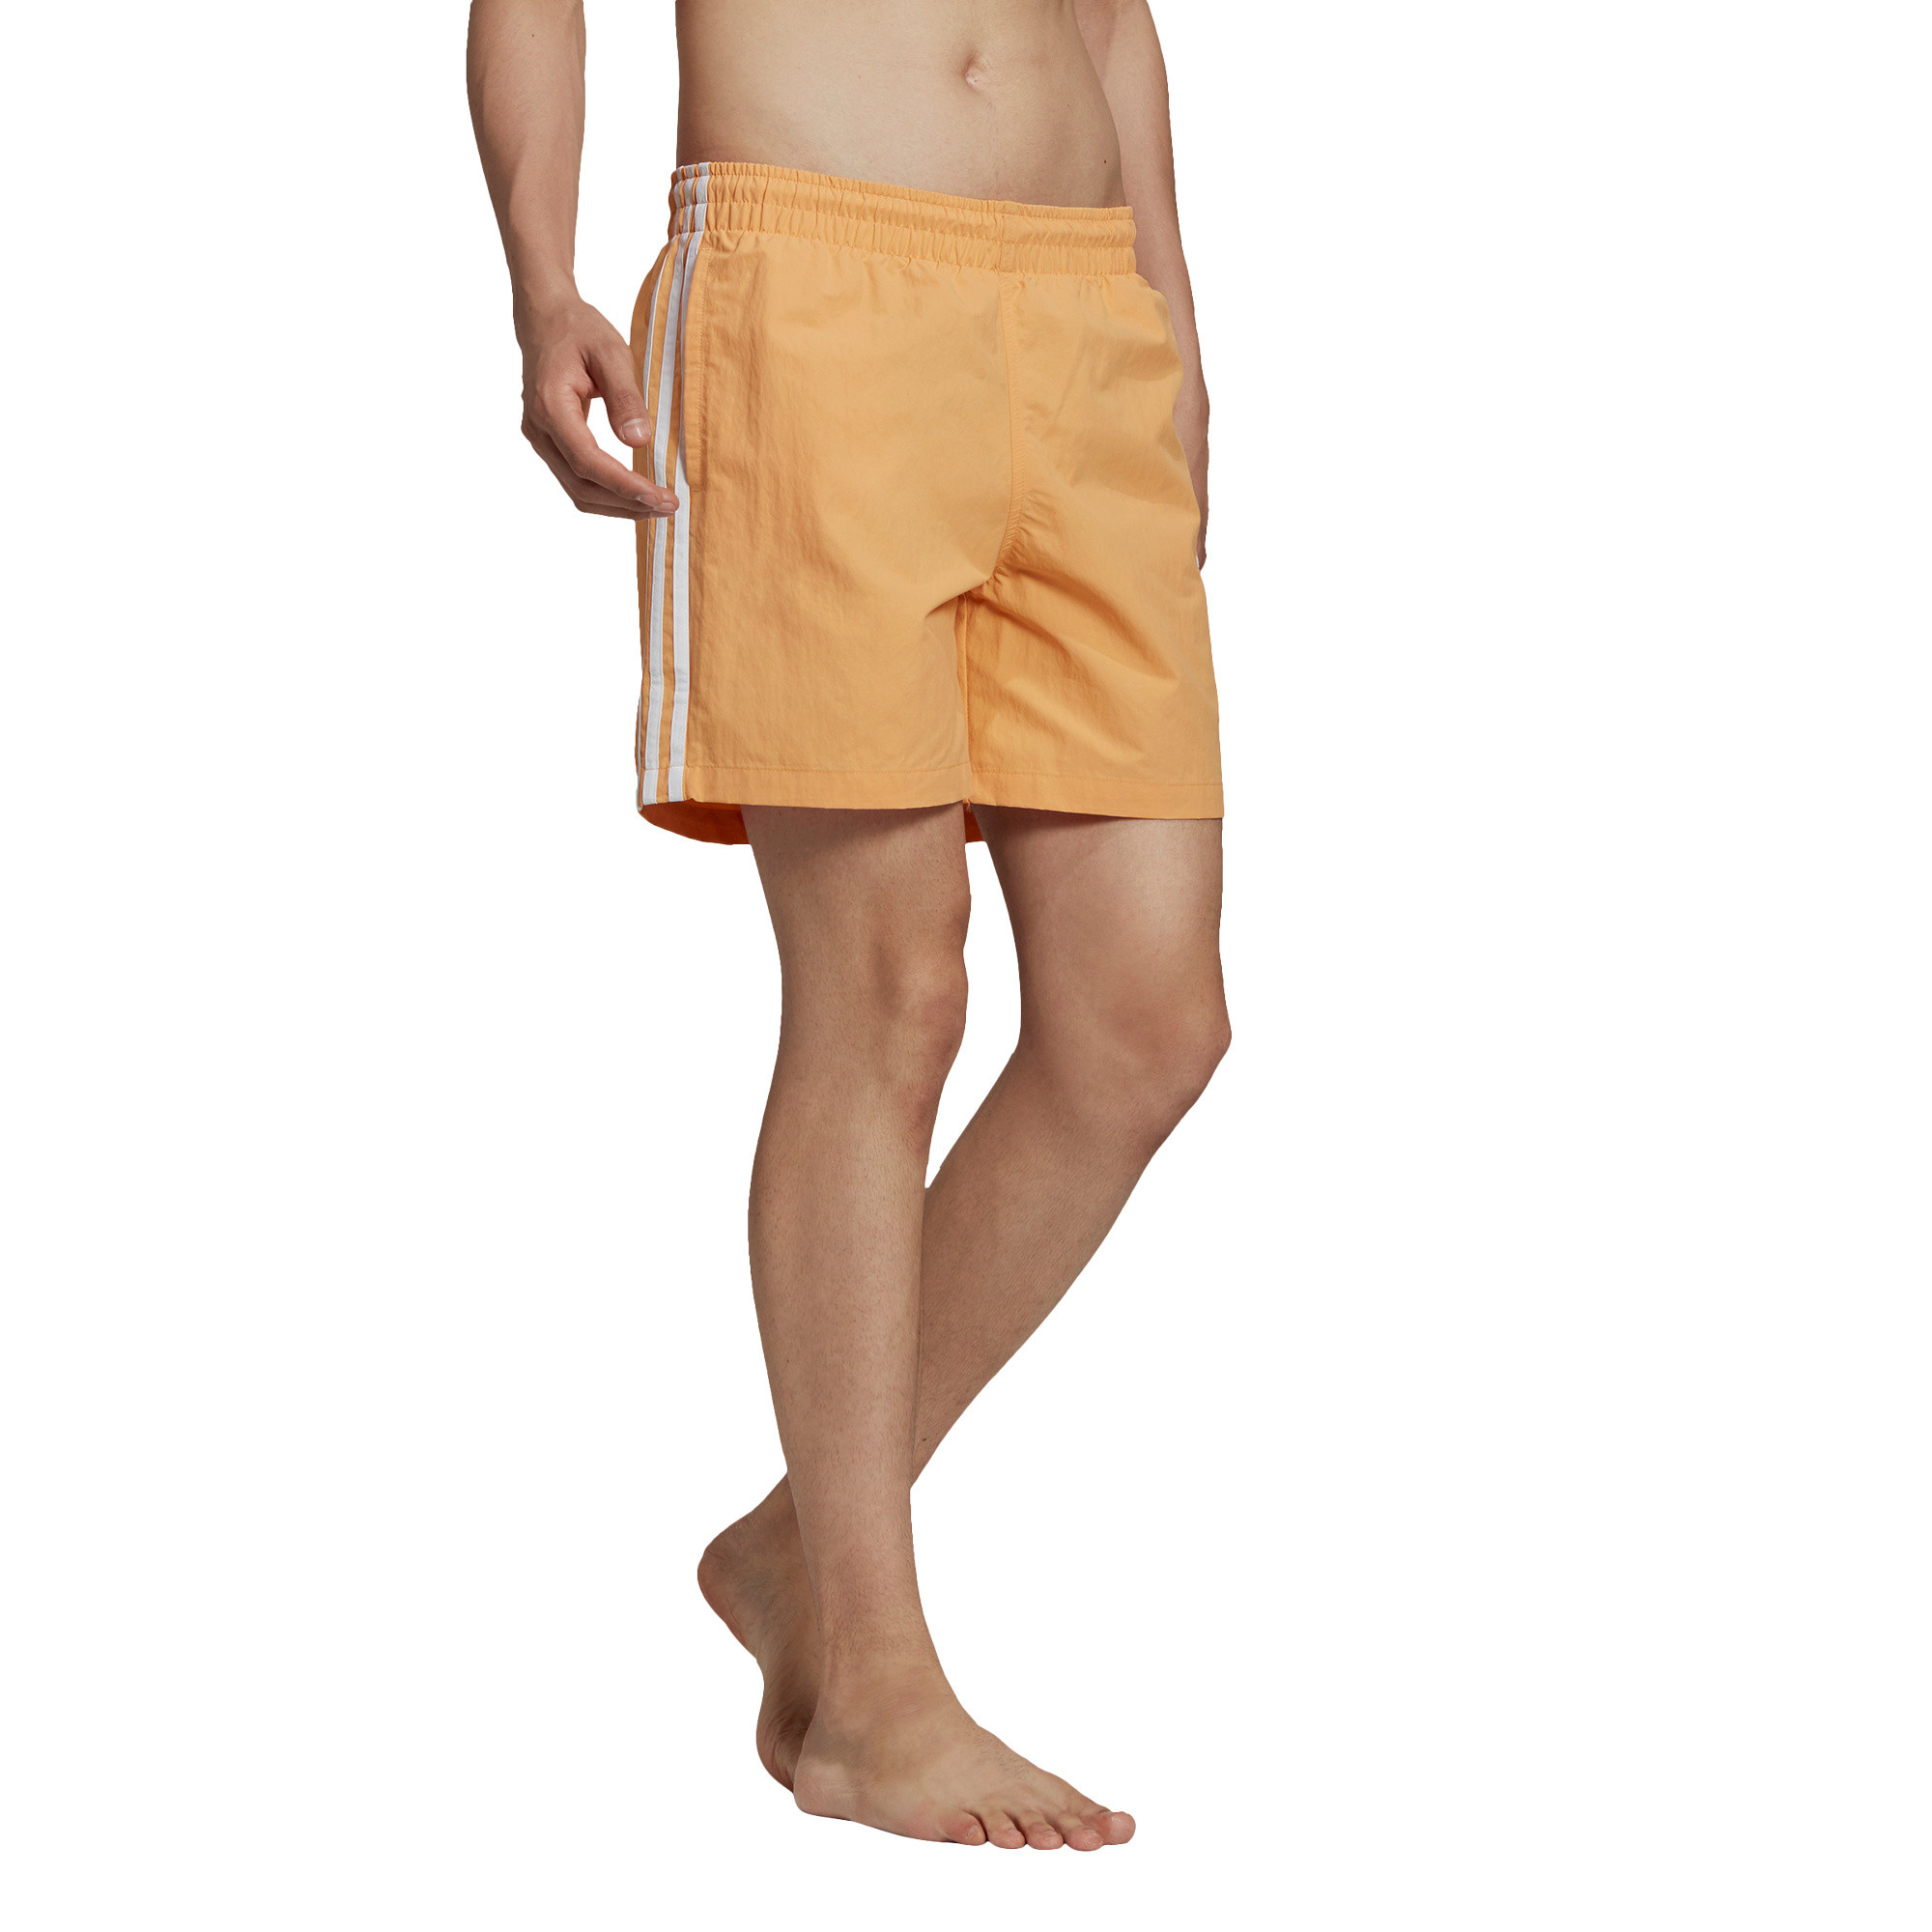 Short da nuoto adicolor classics 3-stripes, Arancione, large image number 1